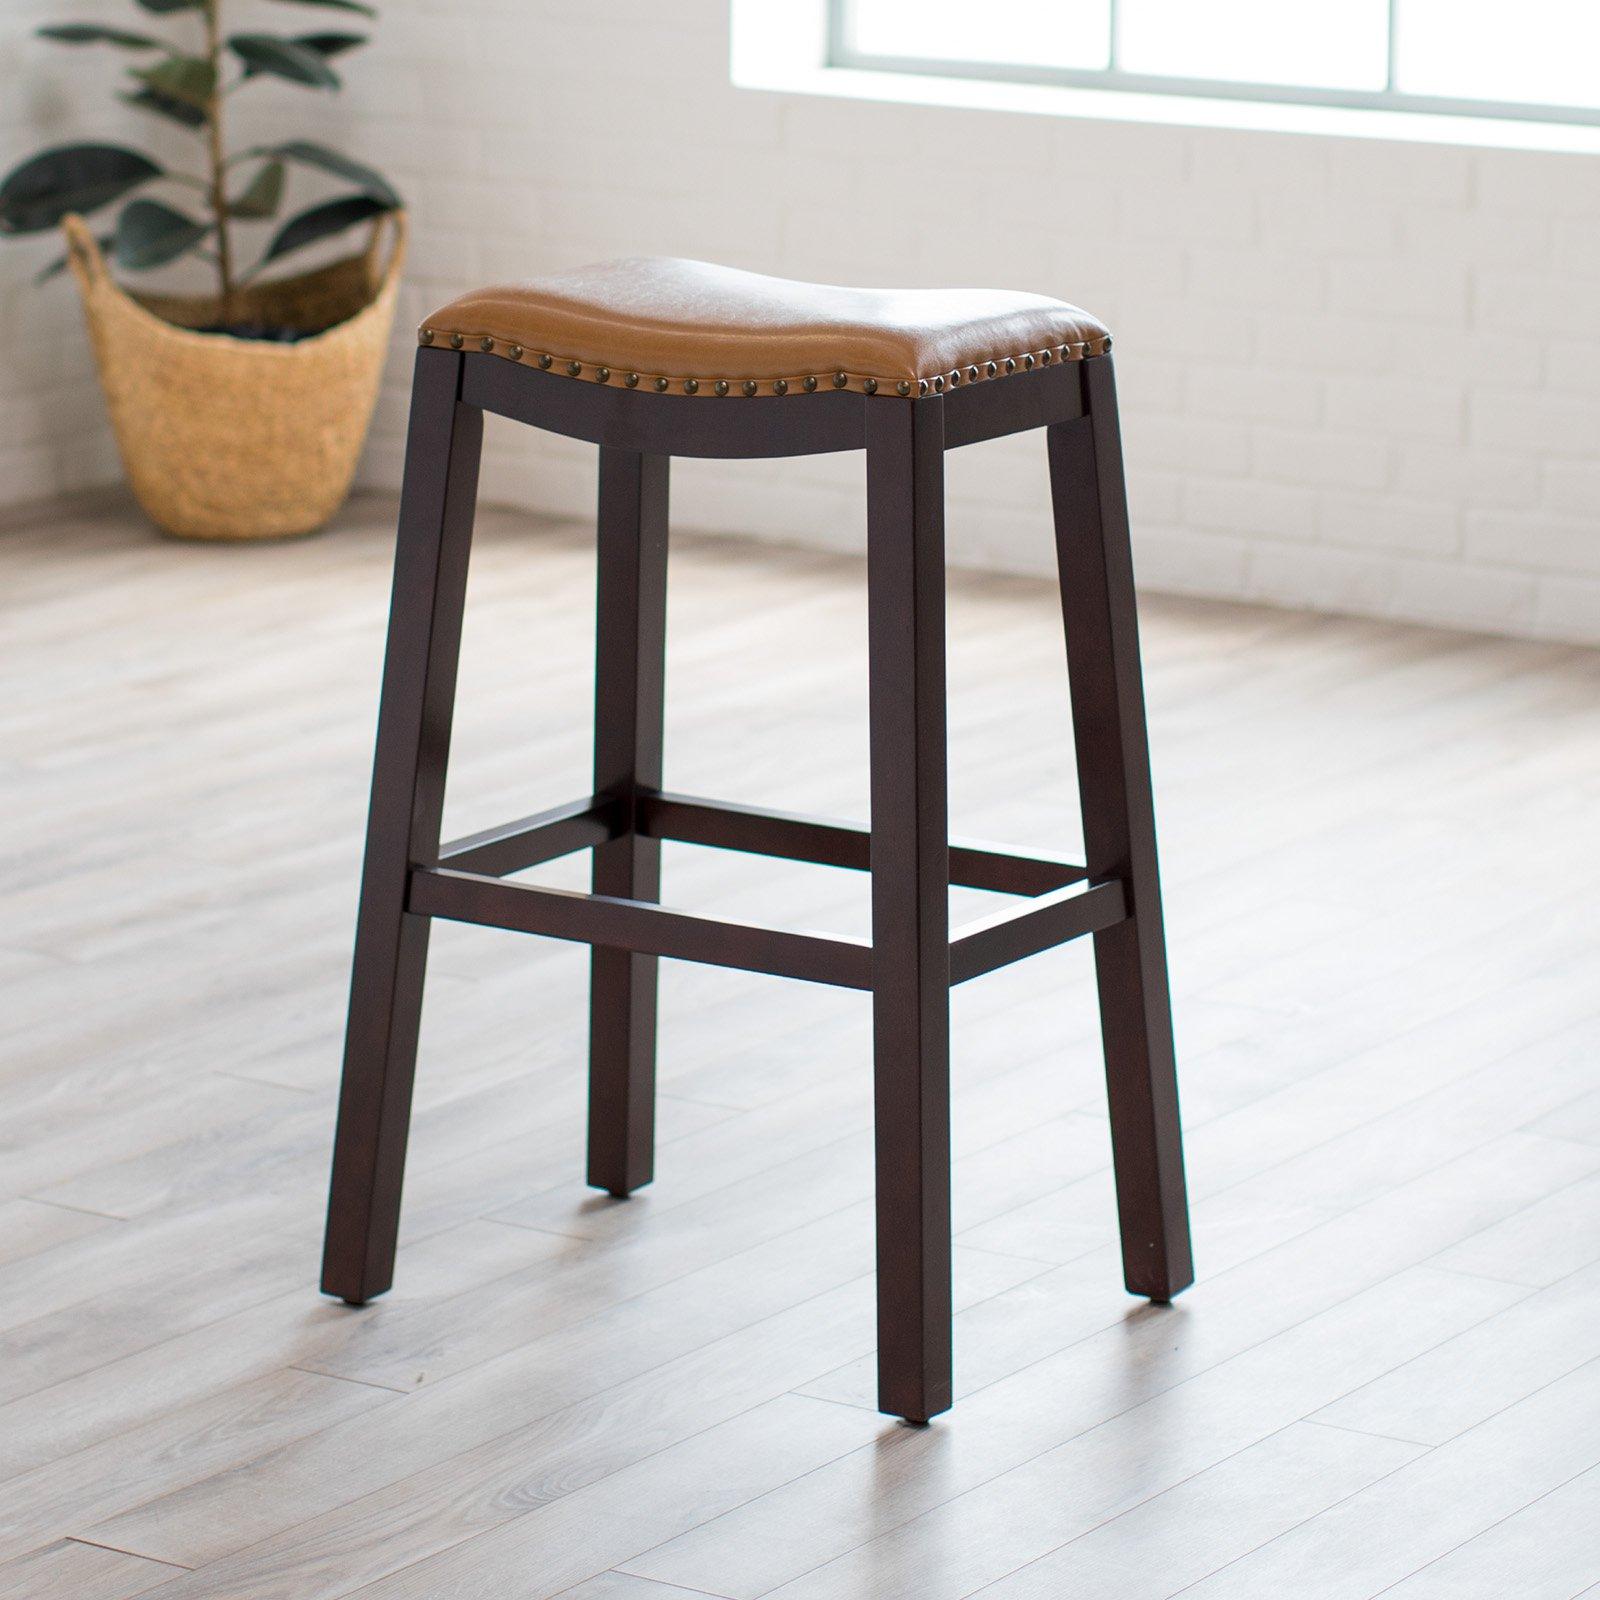 Belham Living Hutton Leather Backless Saddle Counter Stool: Belham Living Hutton Backless Extra Tall Bar Stool